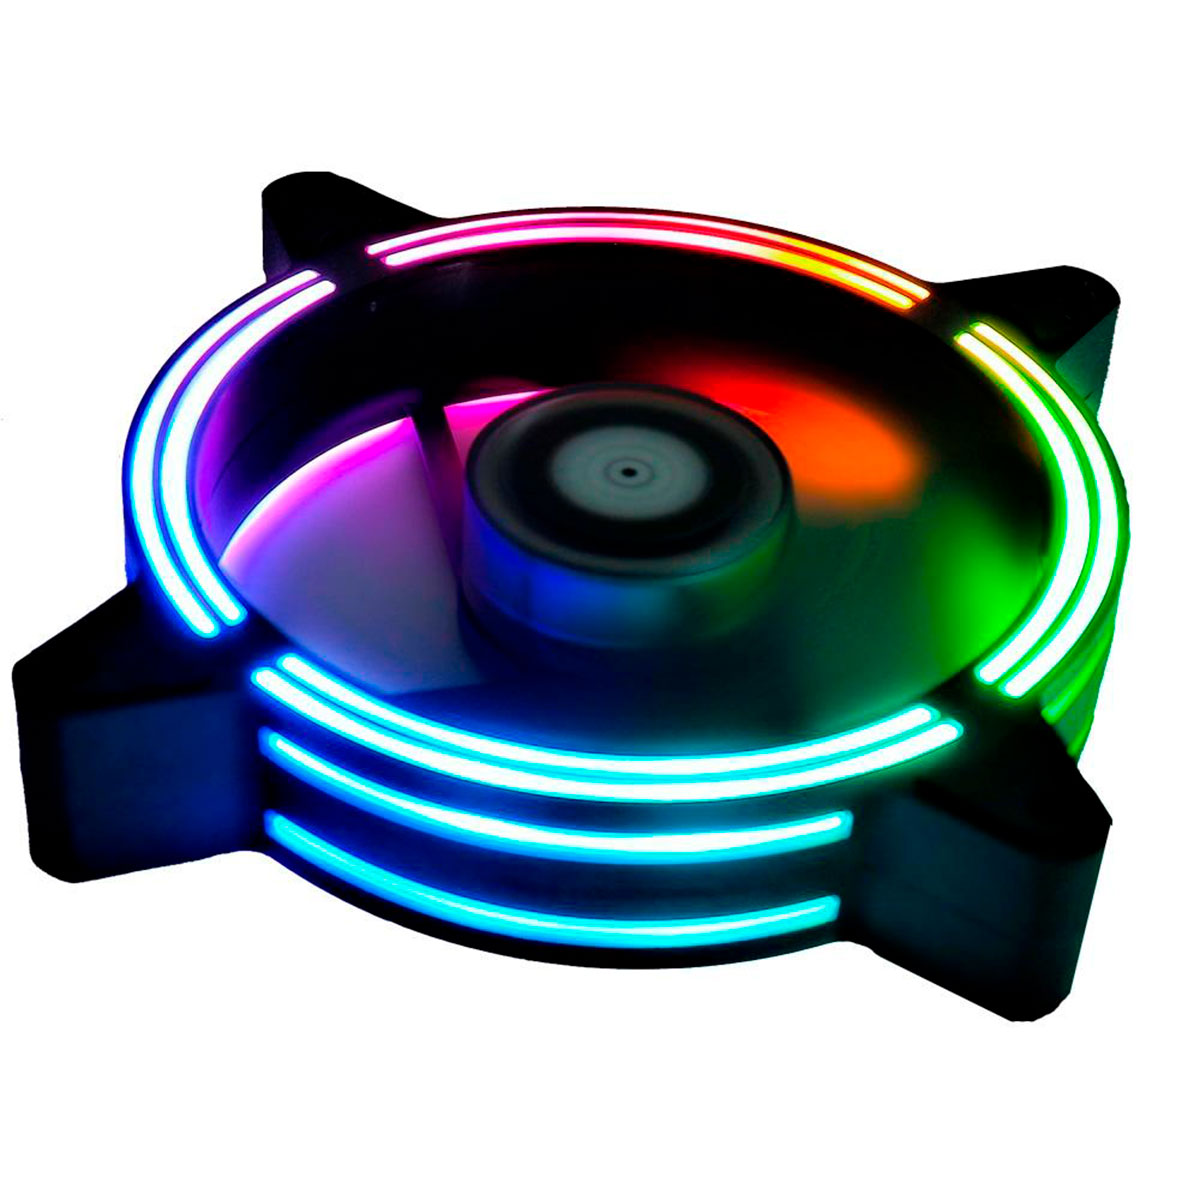 Kit Fan Rise Mode Tornado RGB Energy 3 Fans 120mm RM-TO-02-RGB